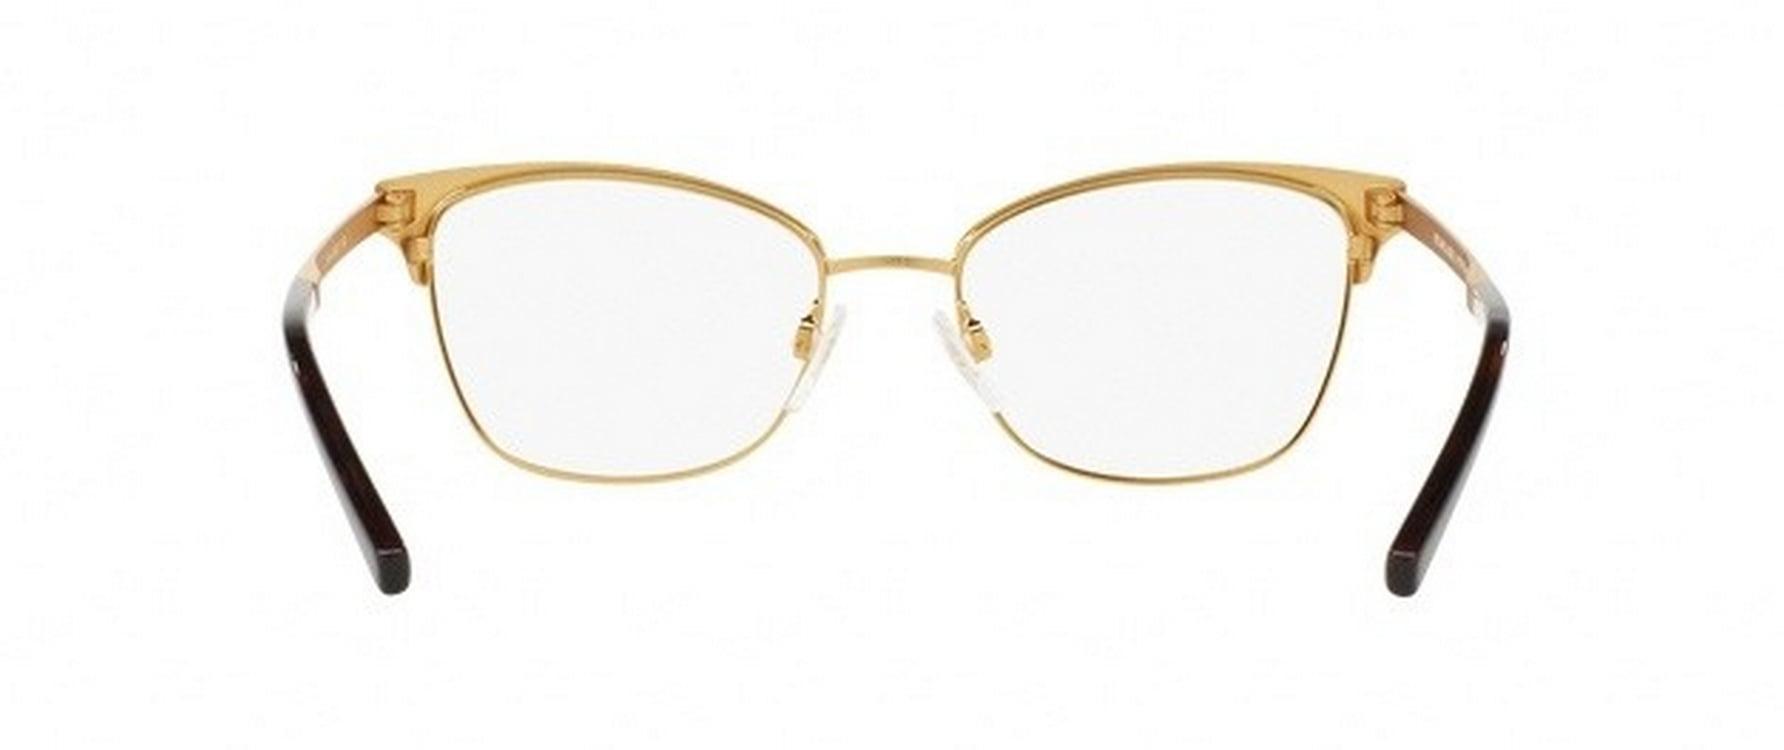 8bd5953c0d MICHAEL KORS Eyeglasses MK3012 ADRIANNA IV 1114 Brown Gold 51MM -  Walmart.com